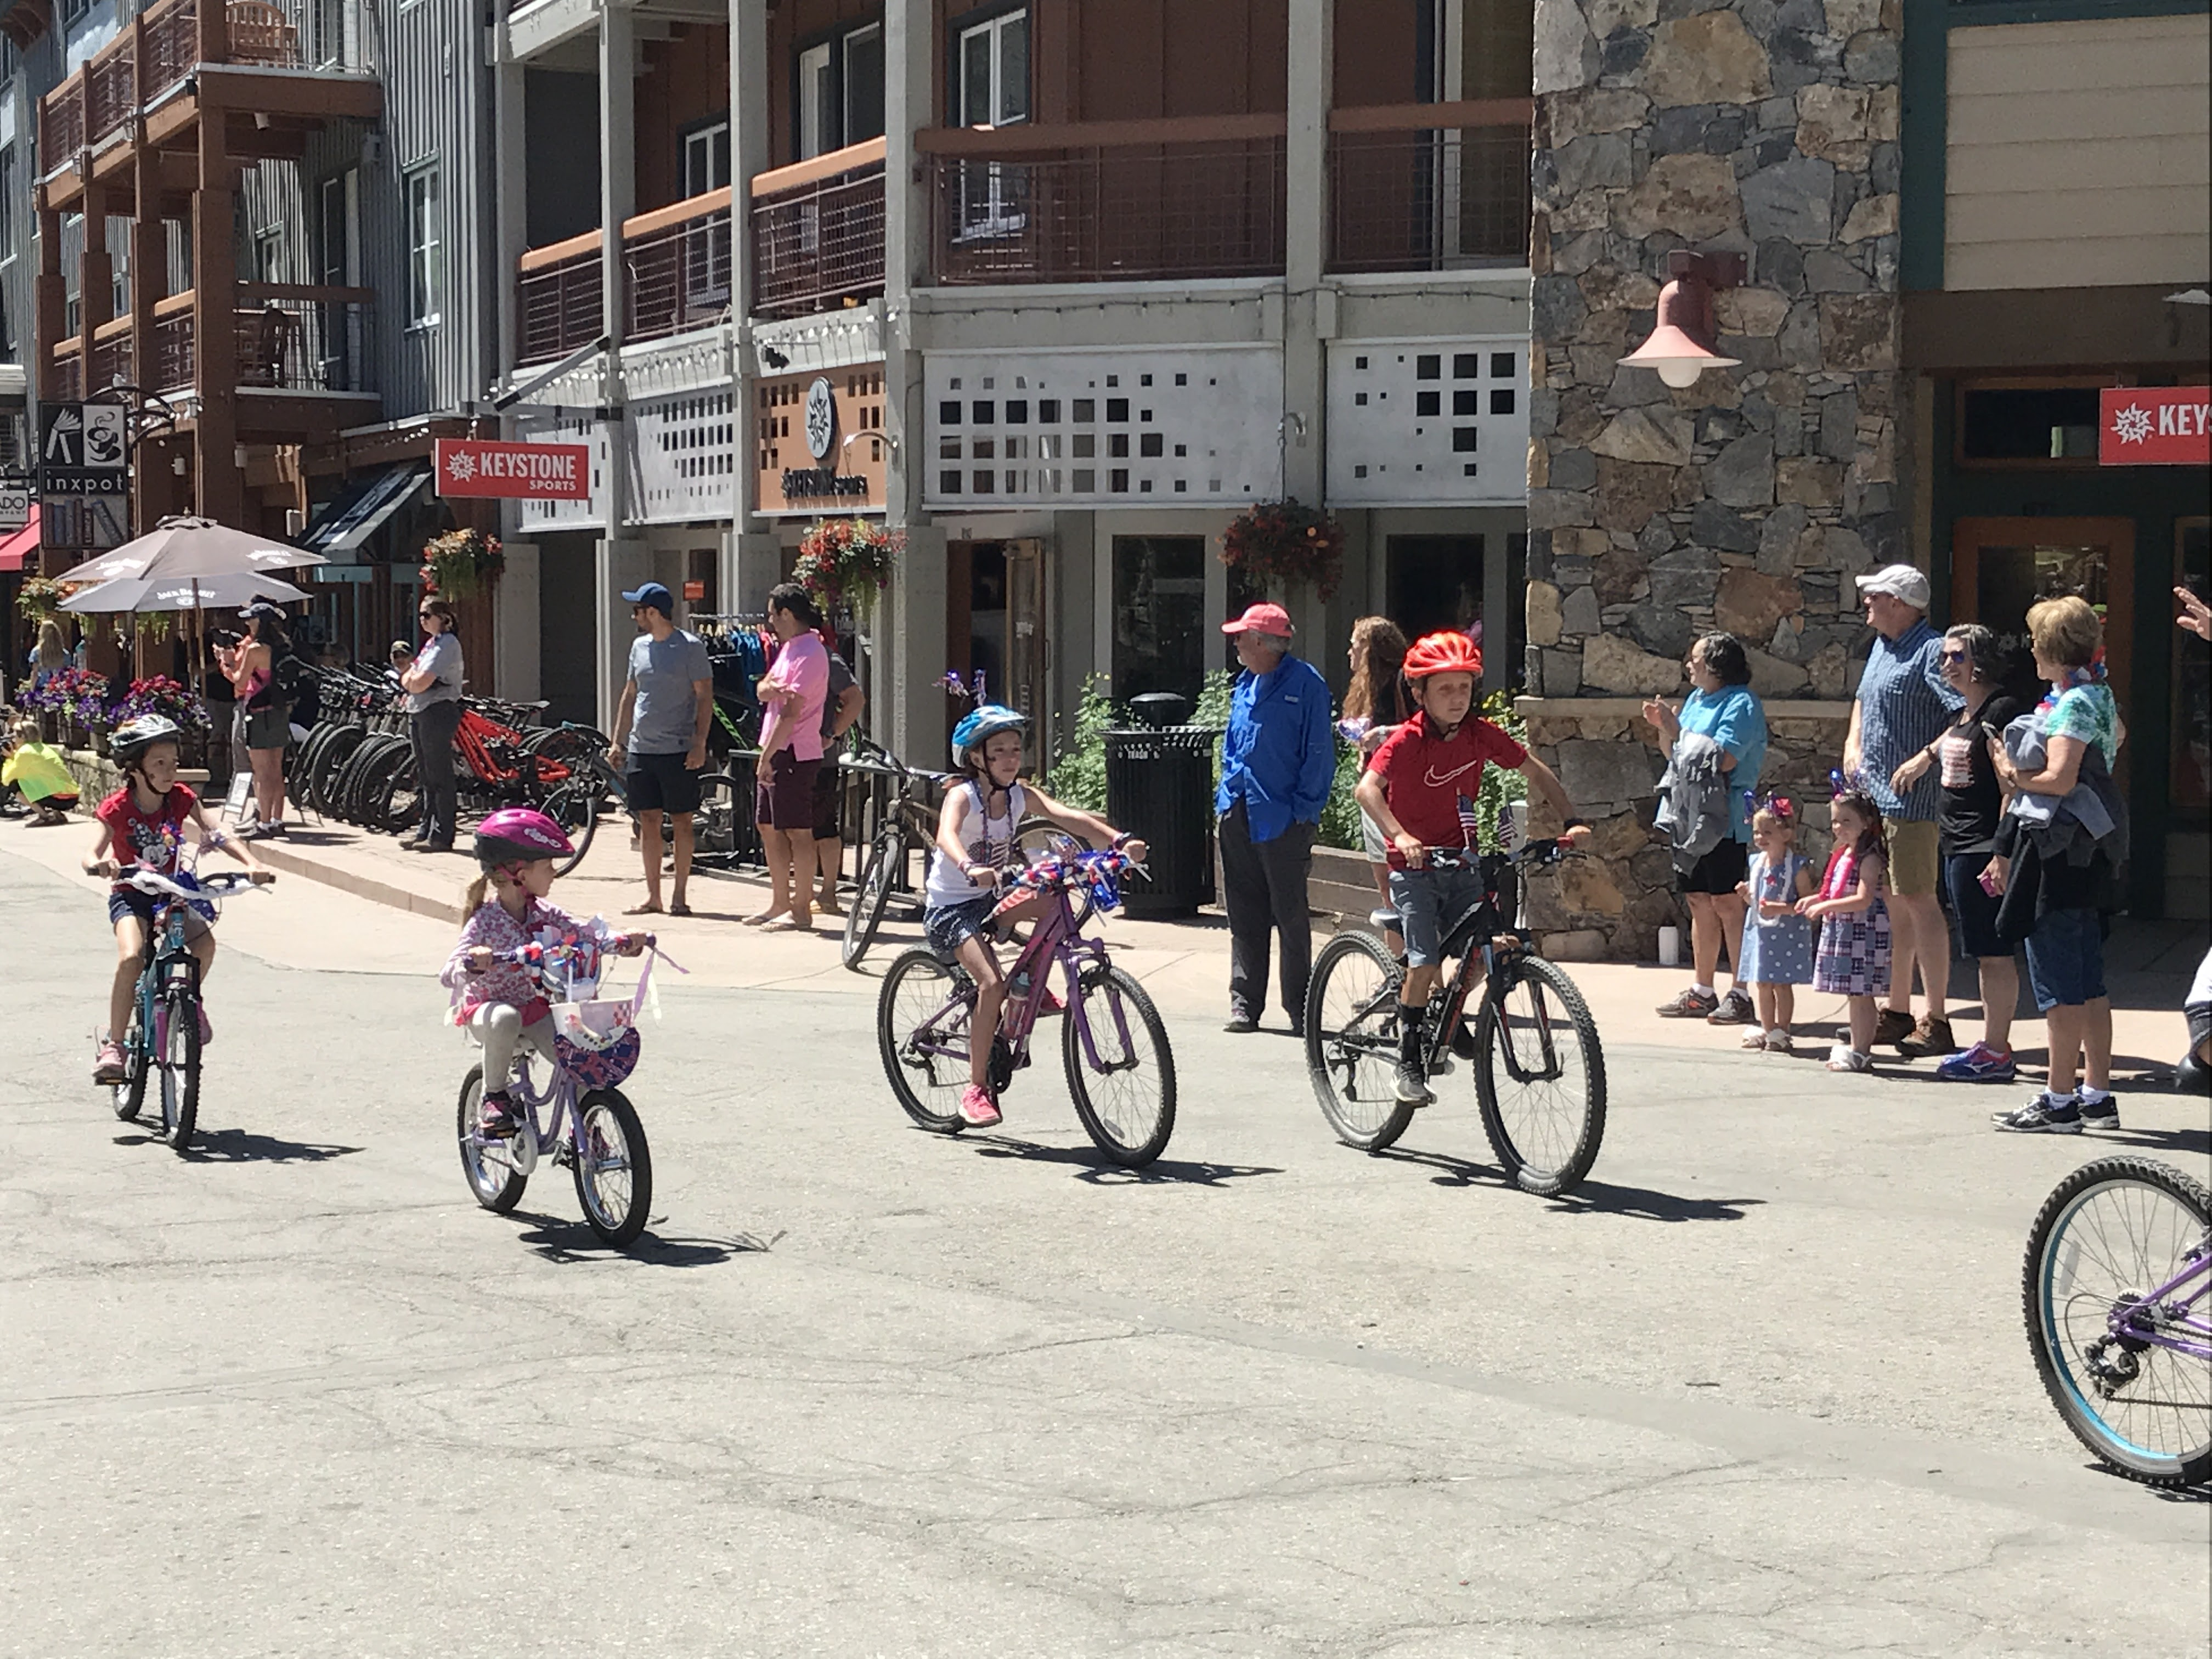 4th Of July River Run Bike Parade